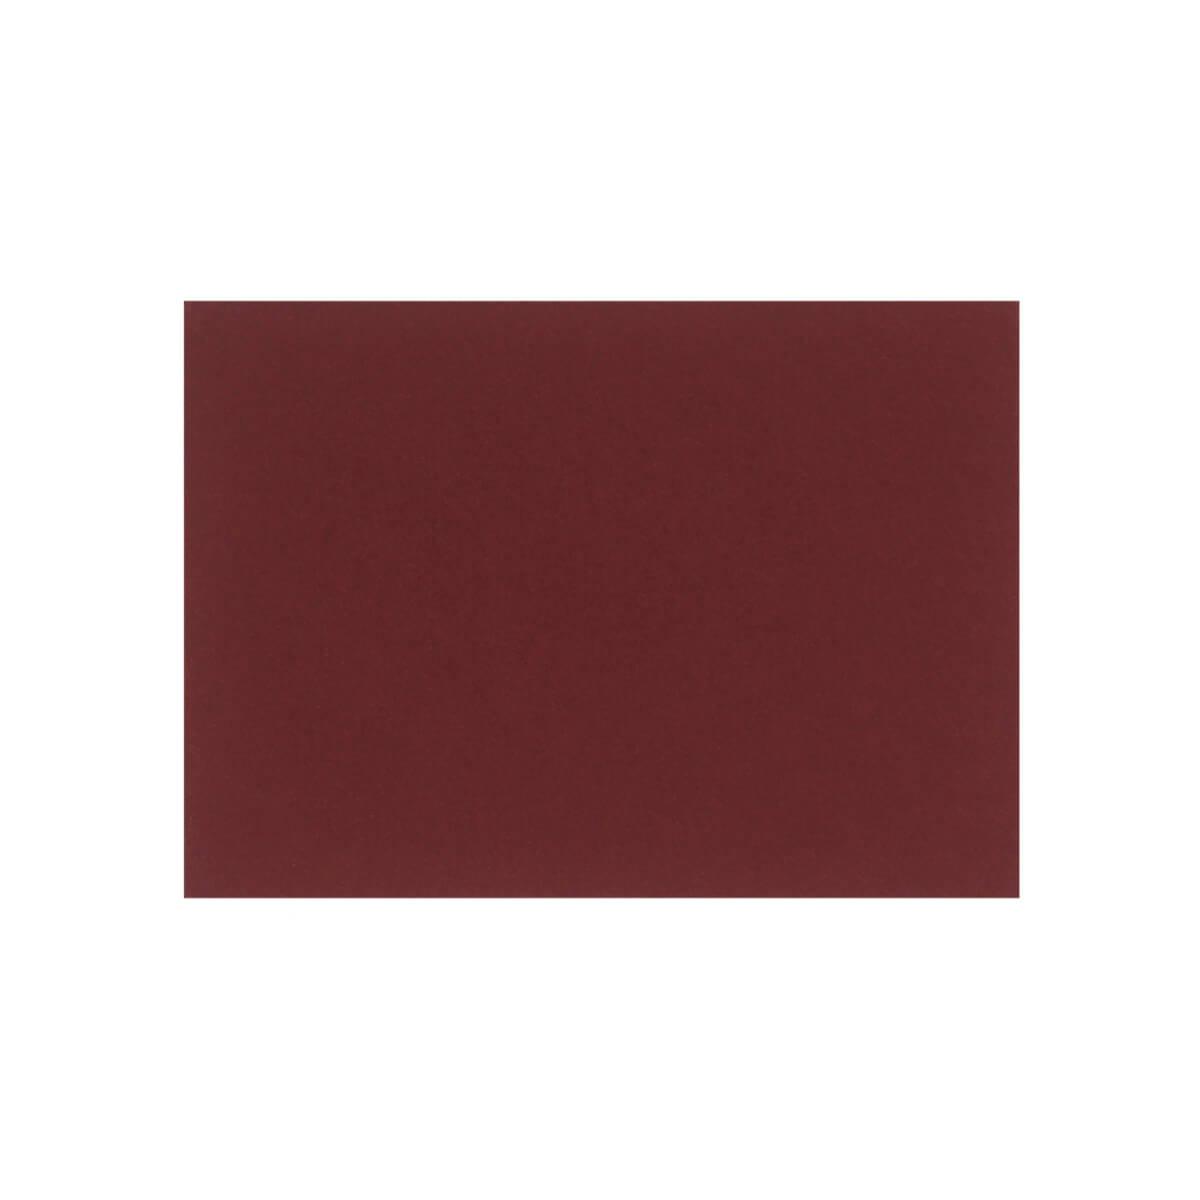 BURGUNDY 125 x 175mm ENVELOPES